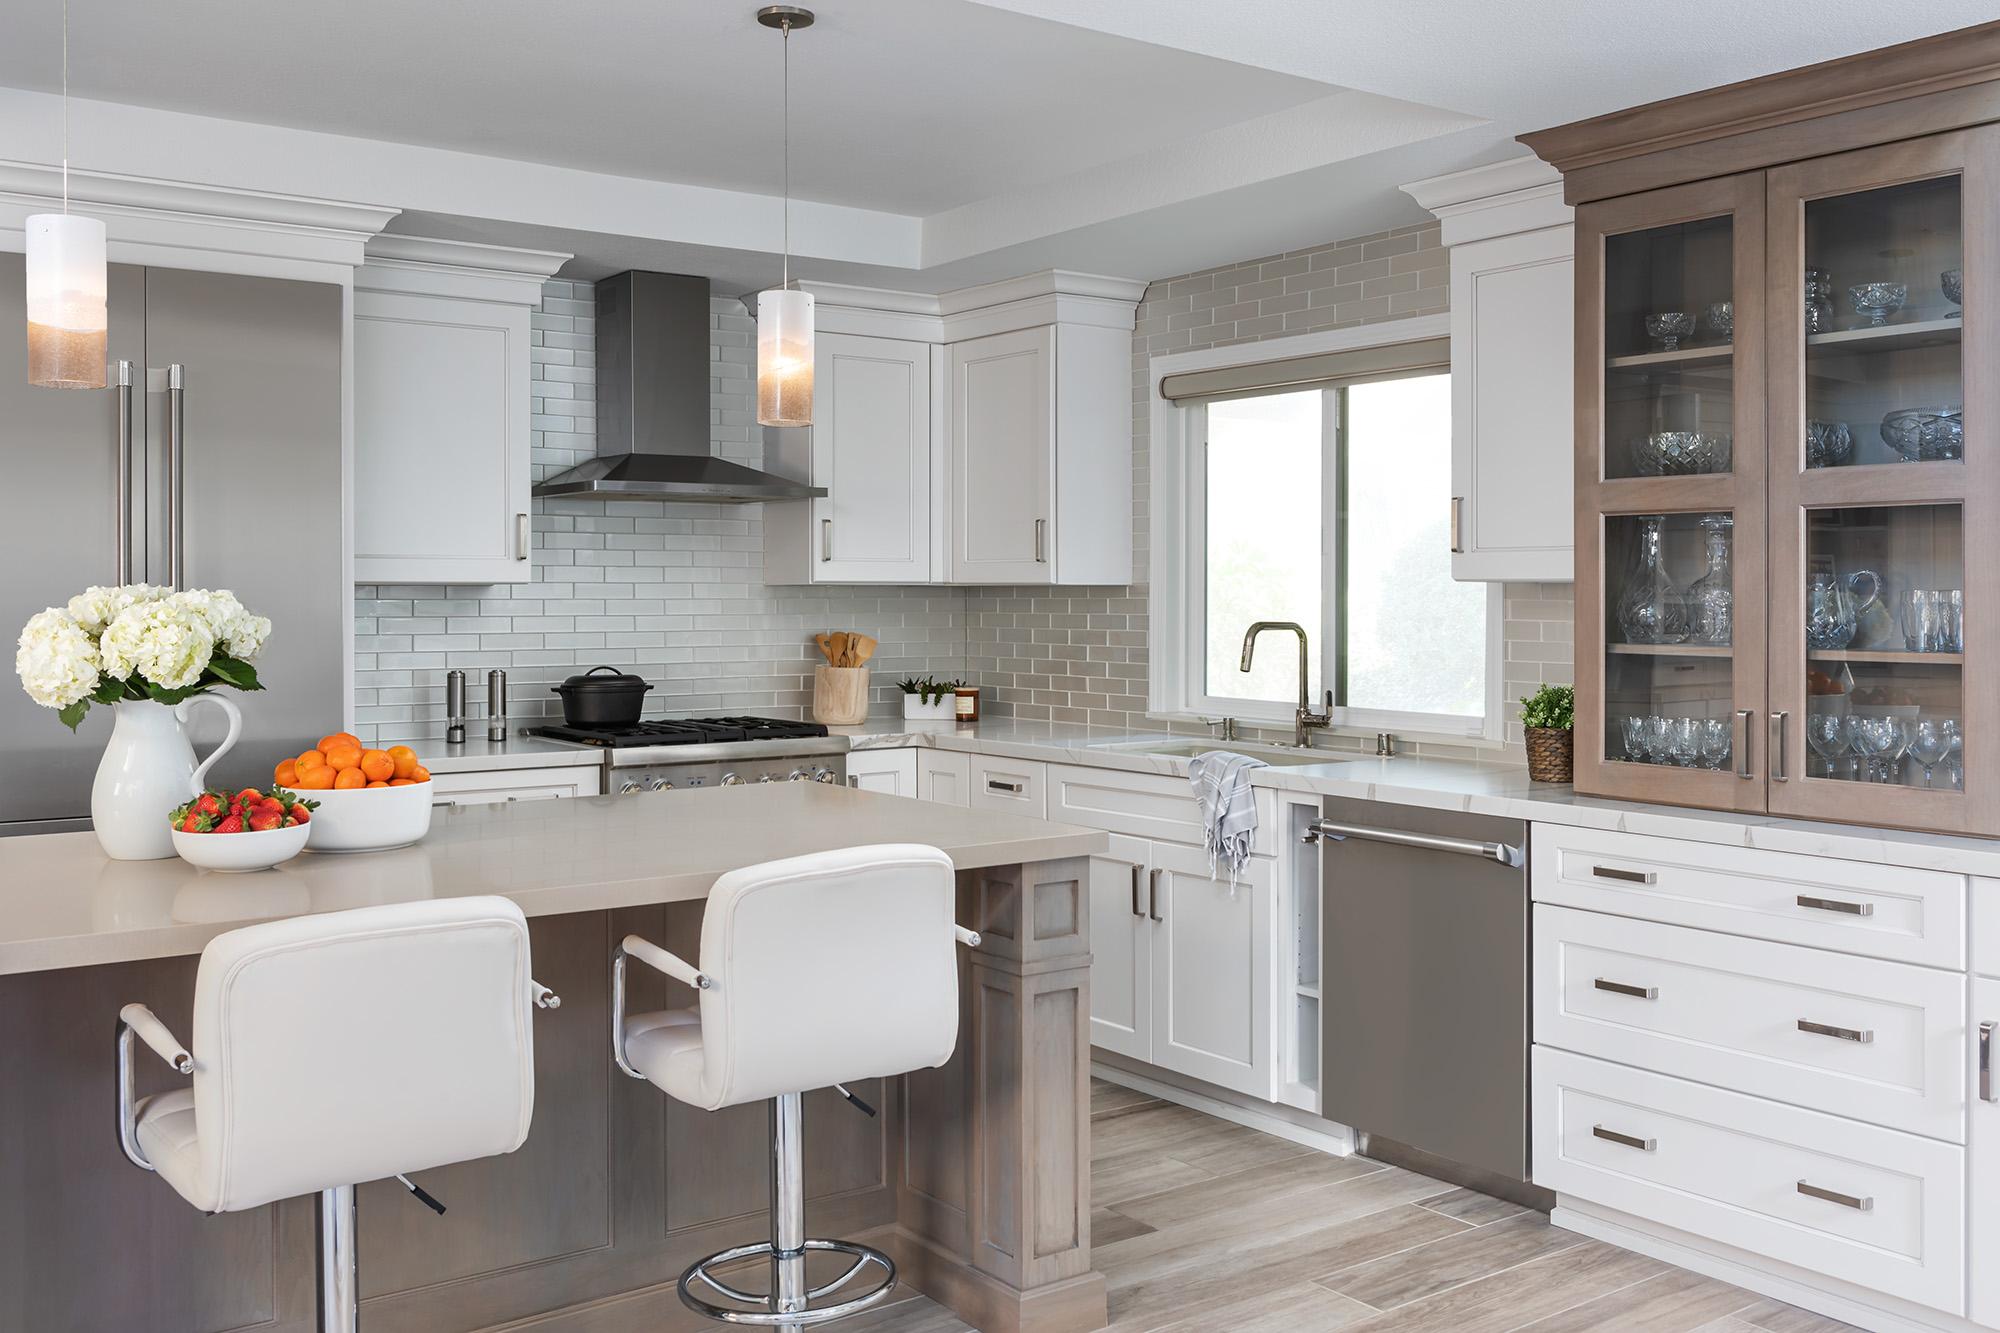 Irvine kitchen remodel includes work from home desk